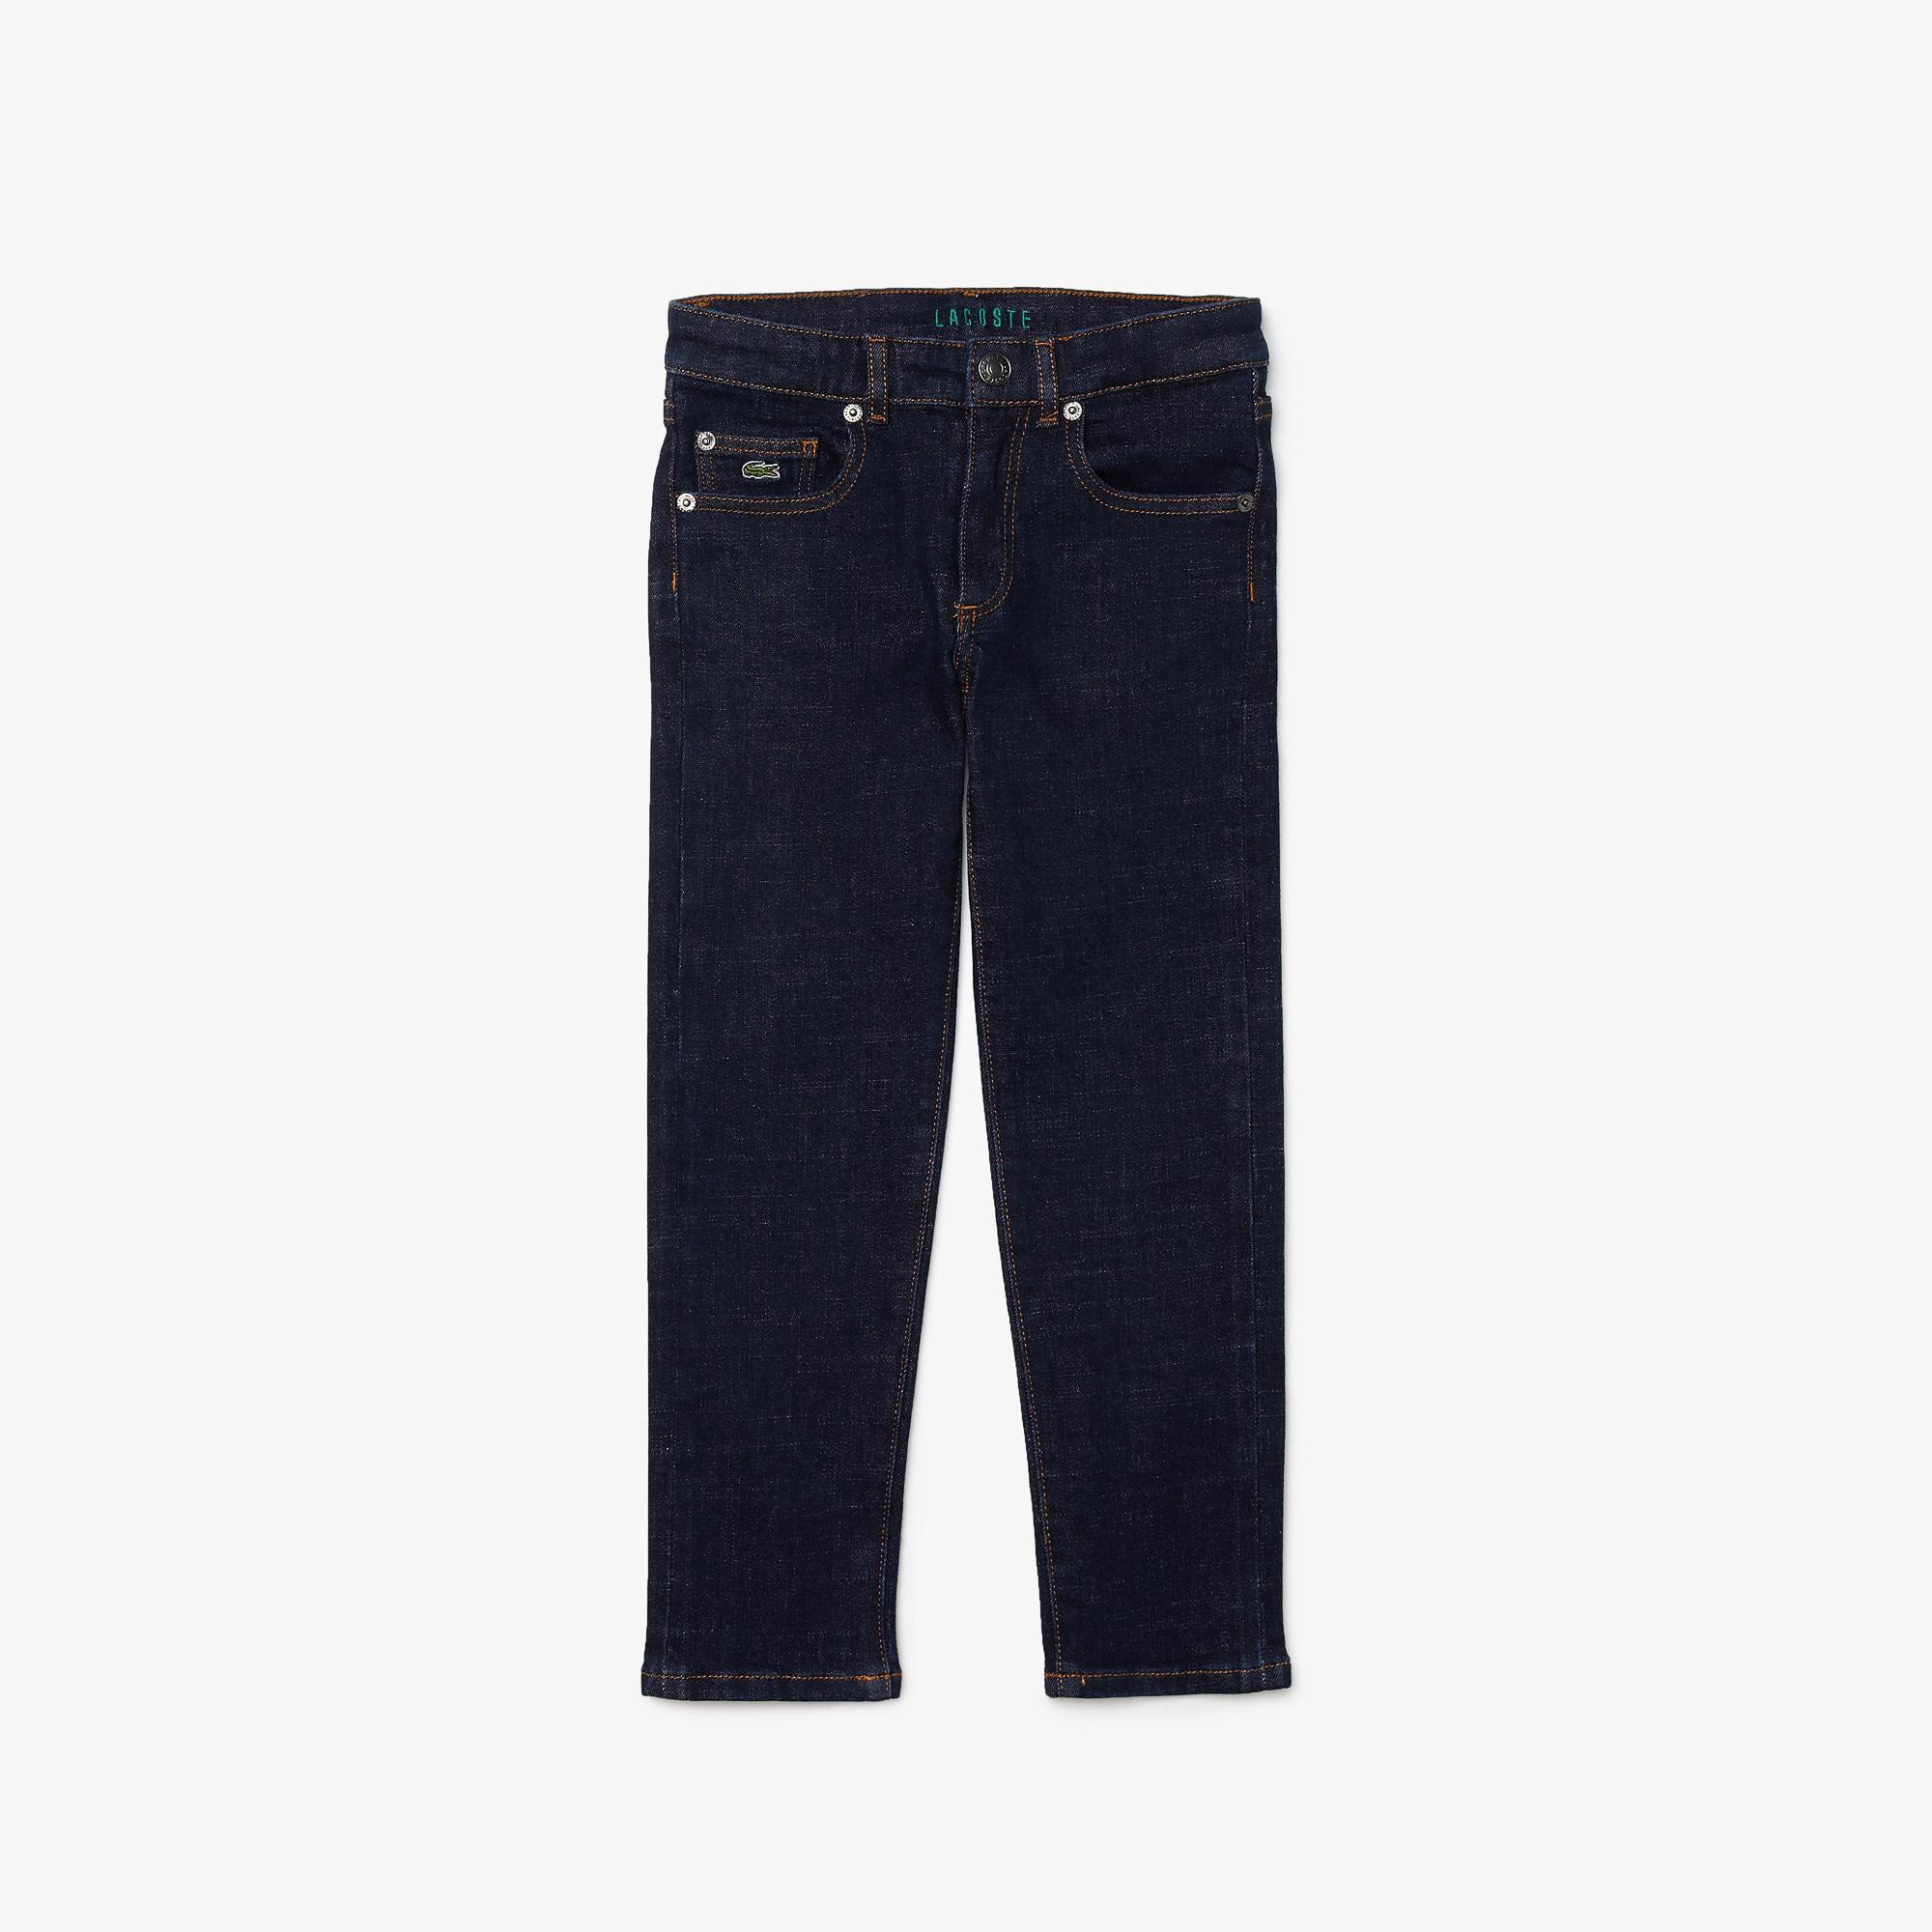 Lacoste Erkek Çocuk Straight Fit Lacivert Denim Pantolon